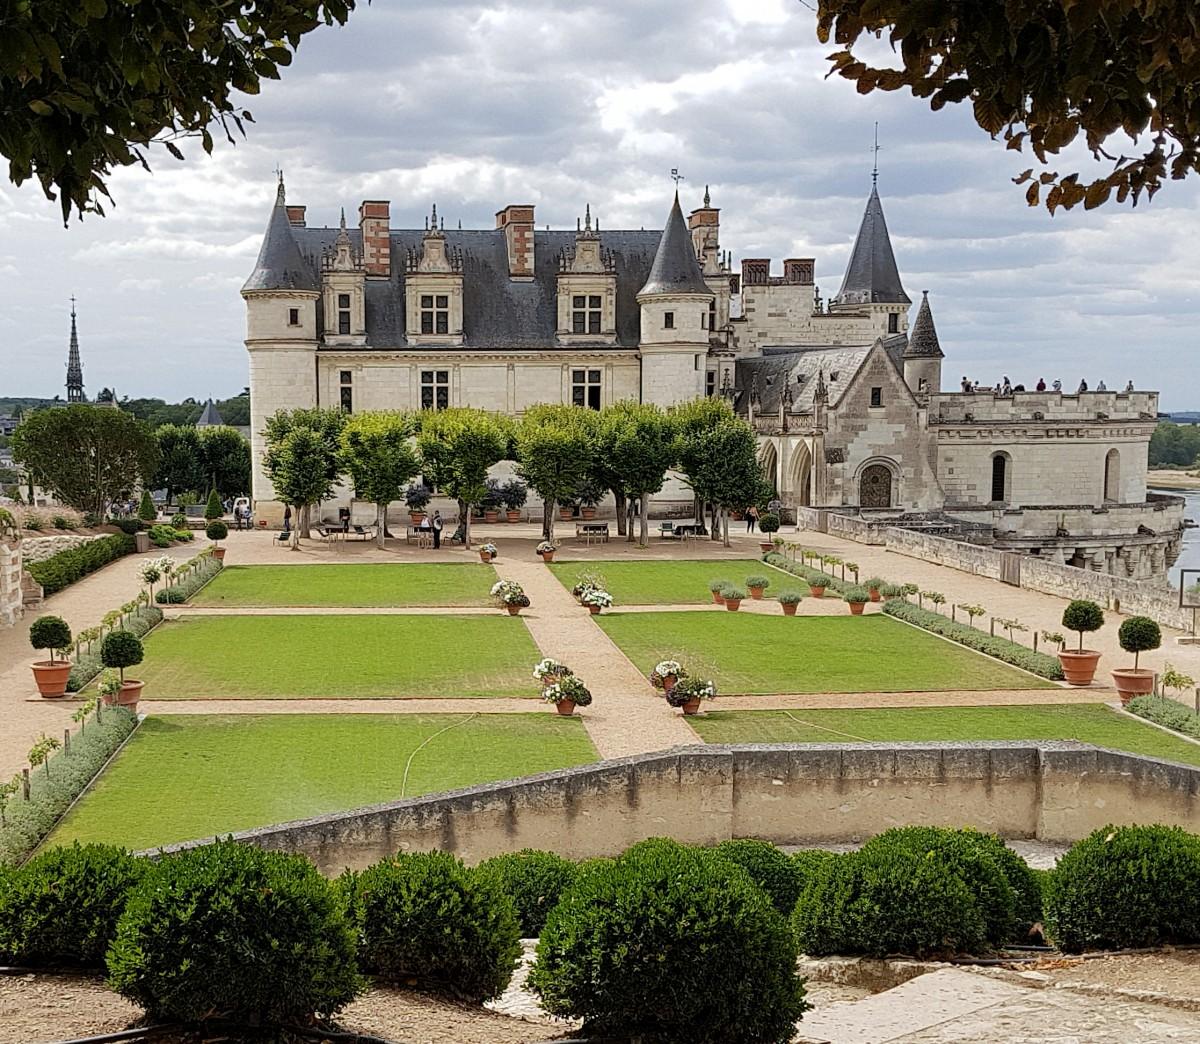 Zdjęcia: Château d'Amboise, Dolina Loary, Pocztówka znad Loary, FRANCJA